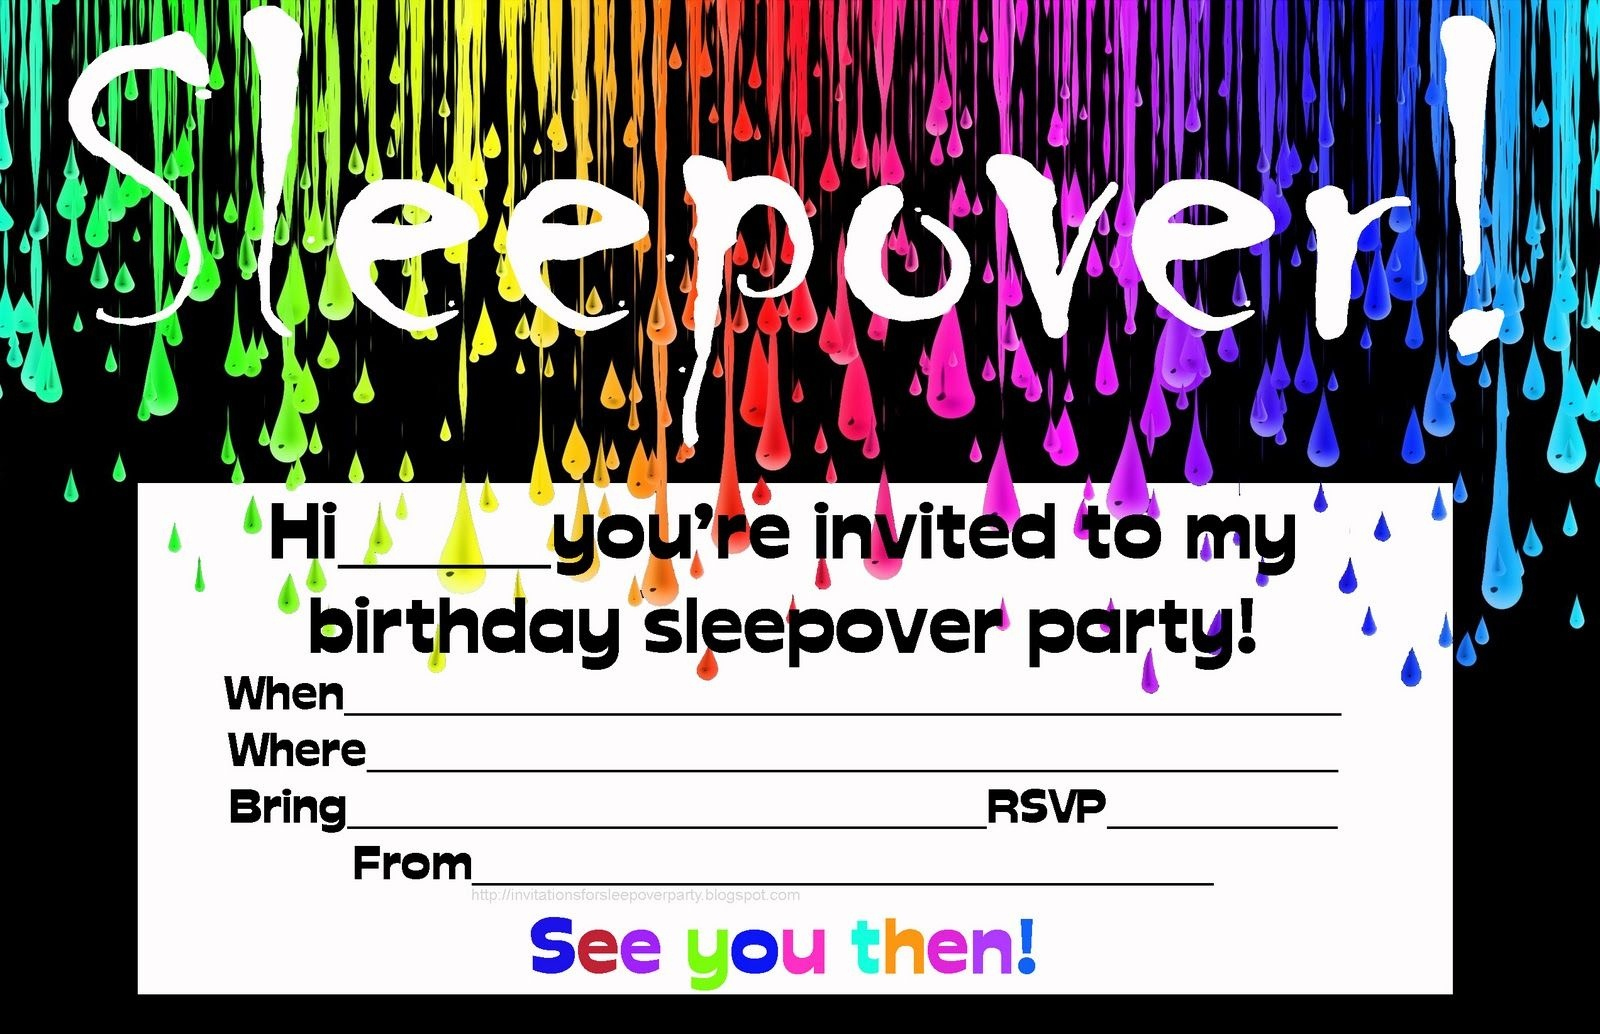 Free Printable Birthday Invitation Templates Tye Dye | Invitions In - Free Printable Glow In The Dark Birthday Party Invitations